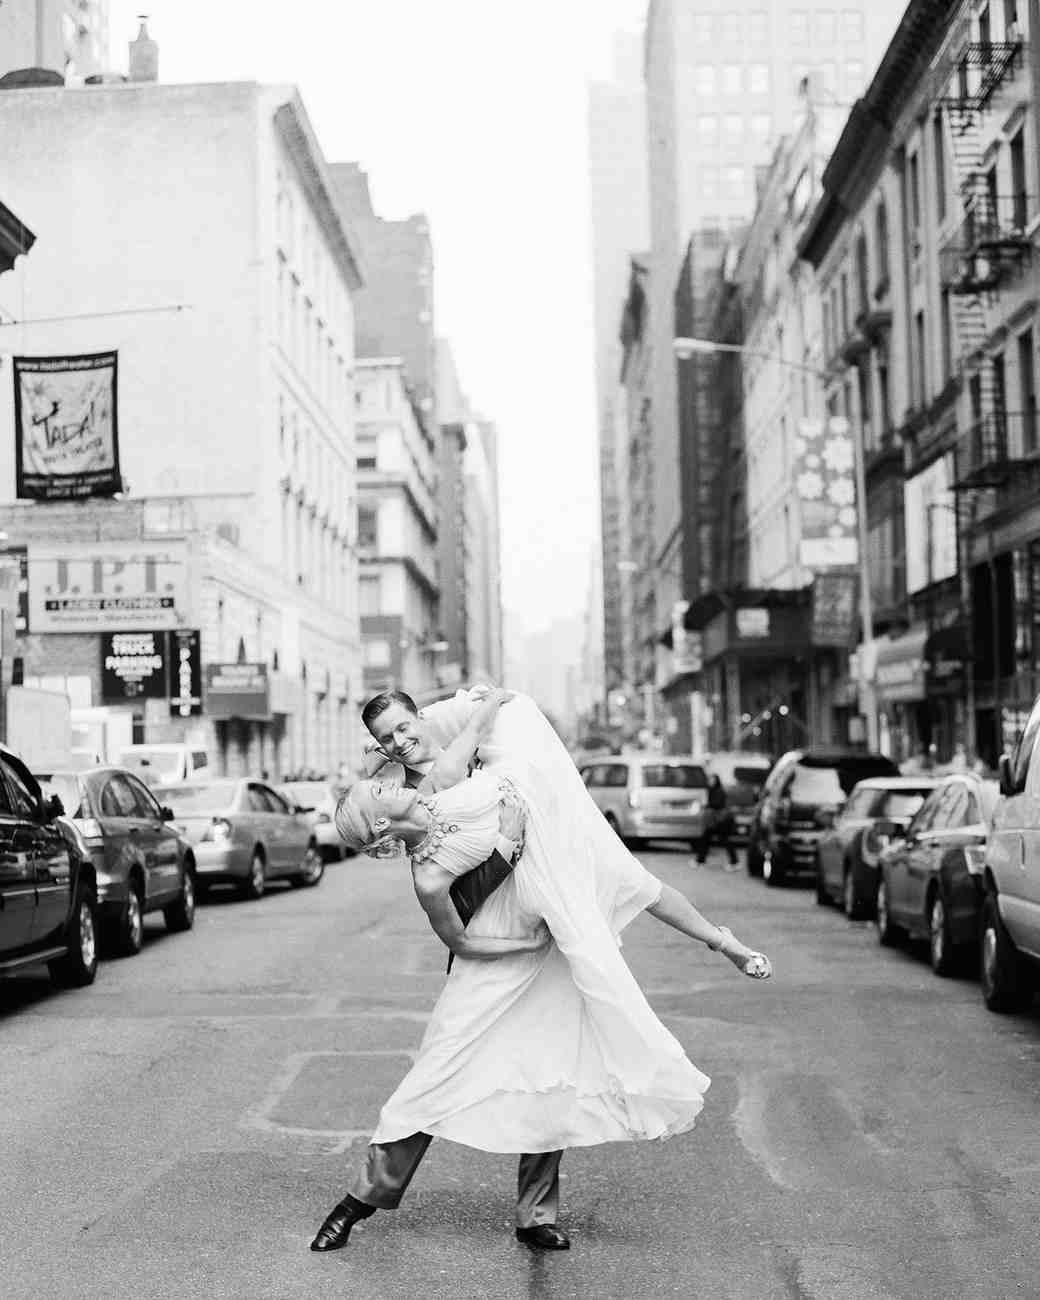 randy-mayo-celebrations-heather-waraksa-dance-post-new-york-1023-s112716.jpg